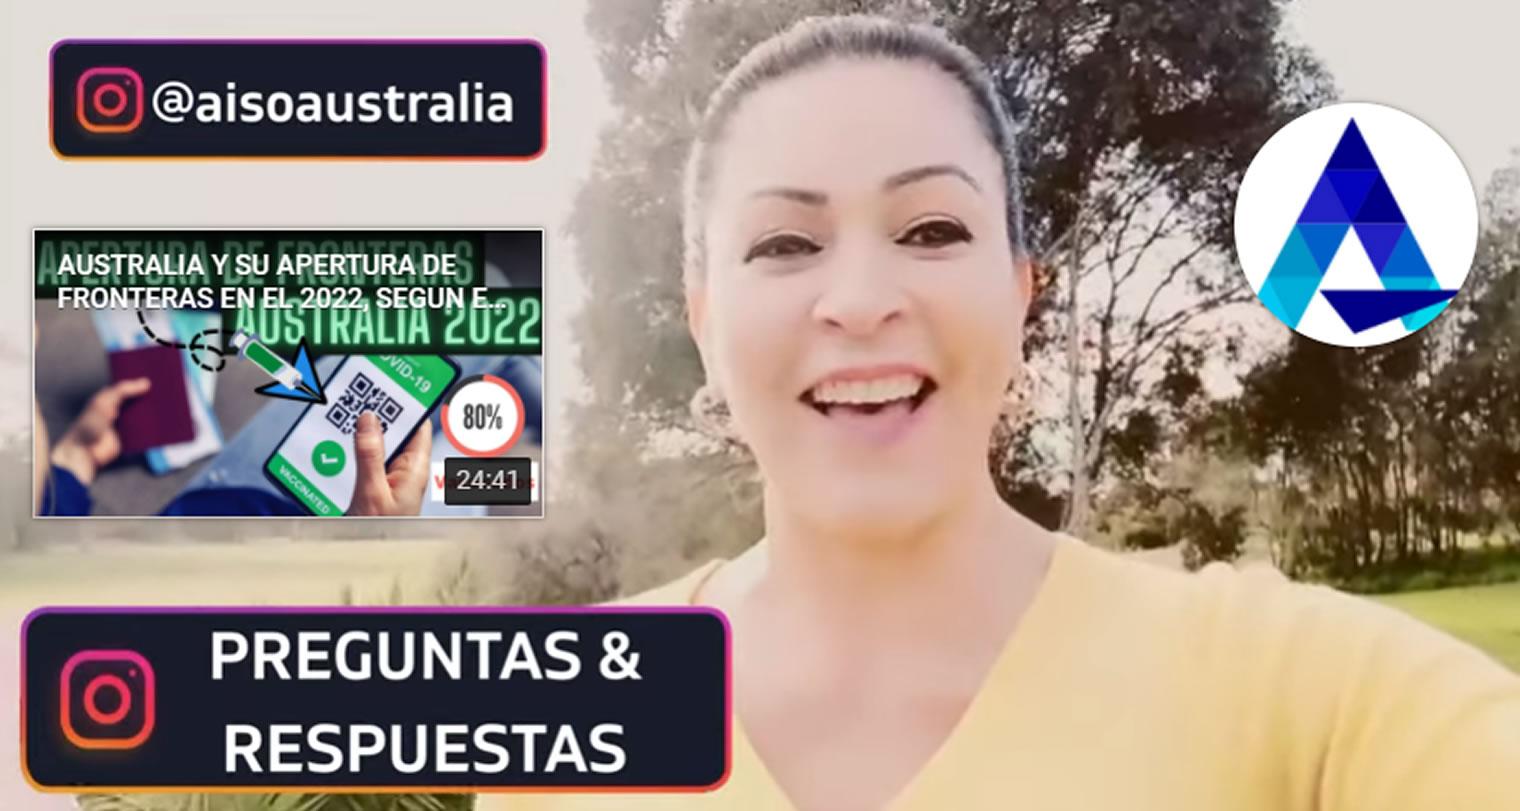 PATRICIA ISAZA INSTAGRAM LIVE AISO AUSTRALIA